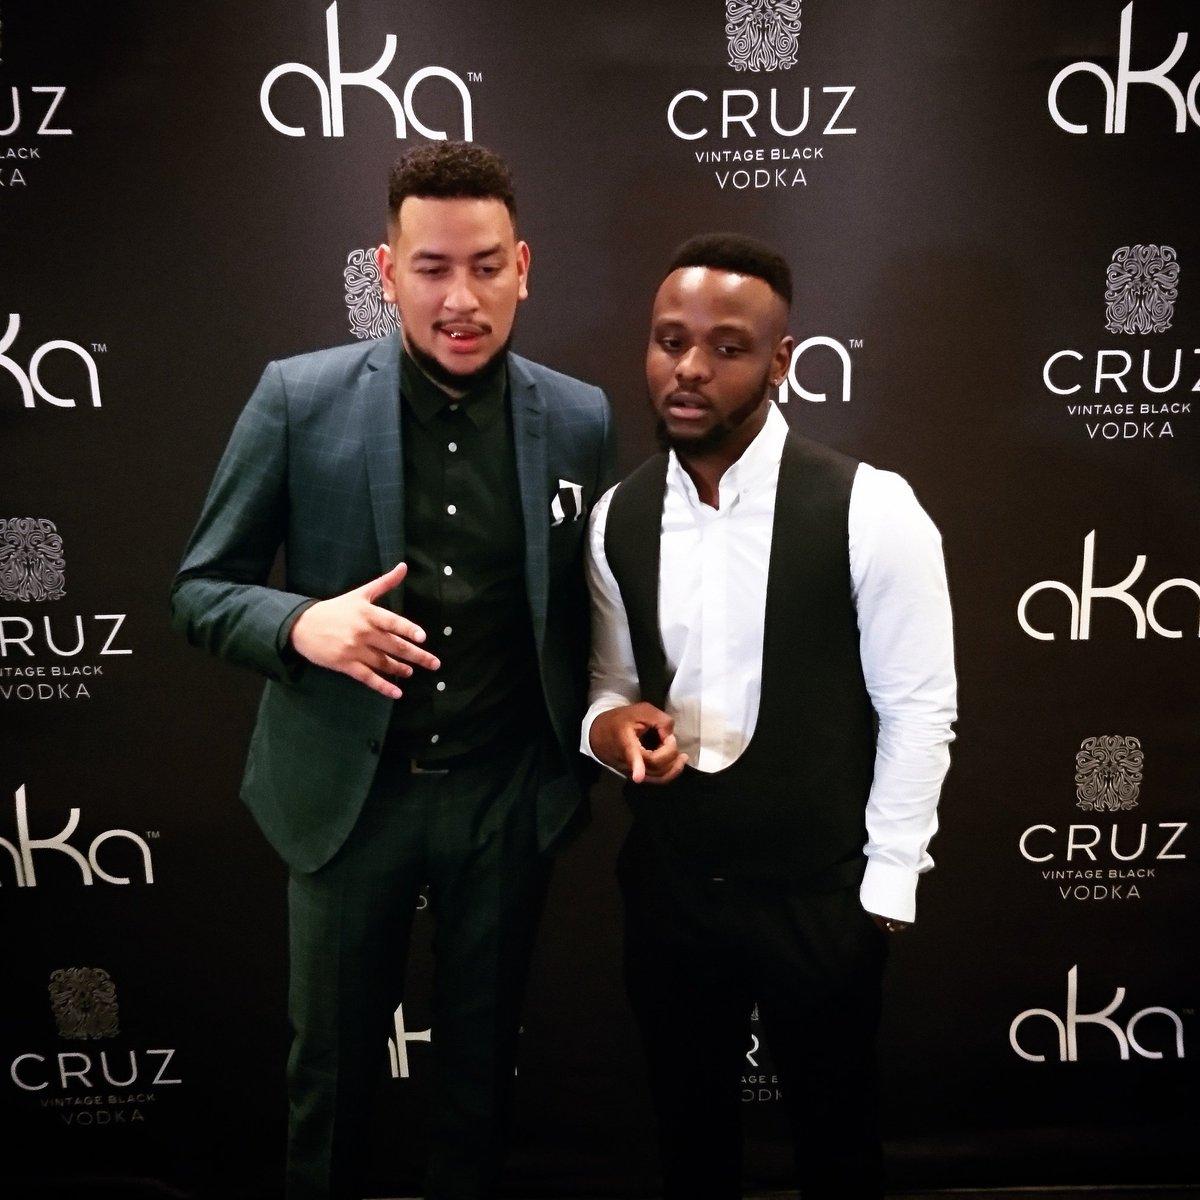 Congrats my brother @akaworldwide Cruz vodka premium lifestyle things. https://t.co/JVQzBSSyVL